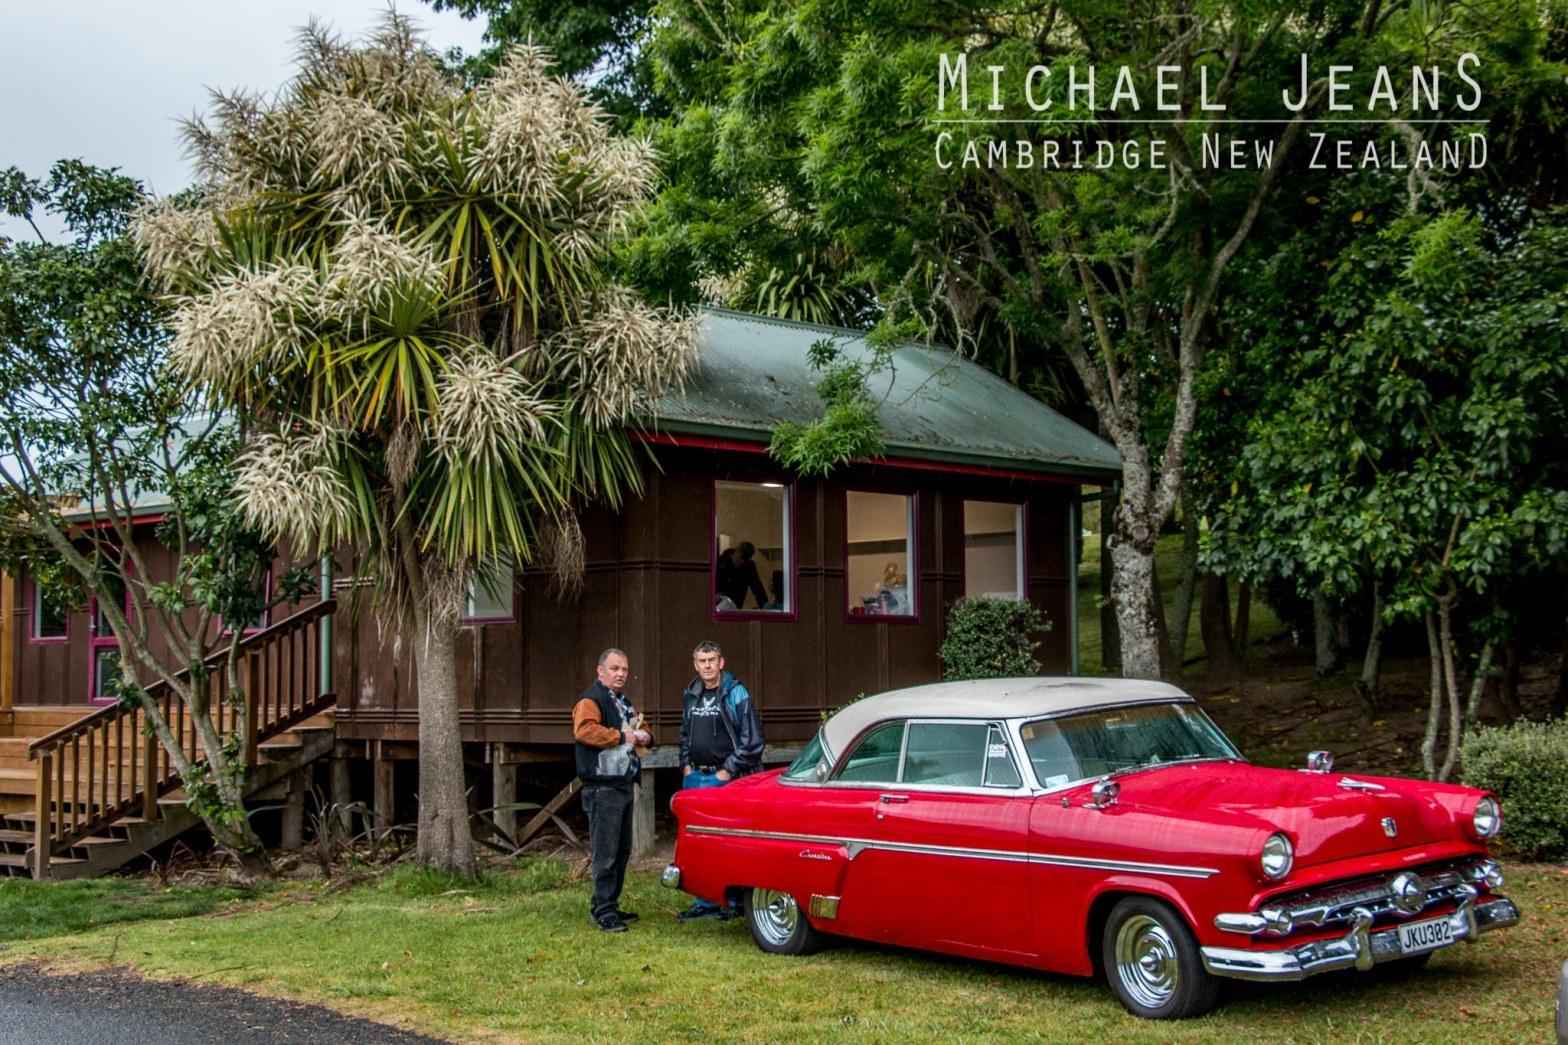 Waikato Vintage Swapmeet Lake Karapiro 2015